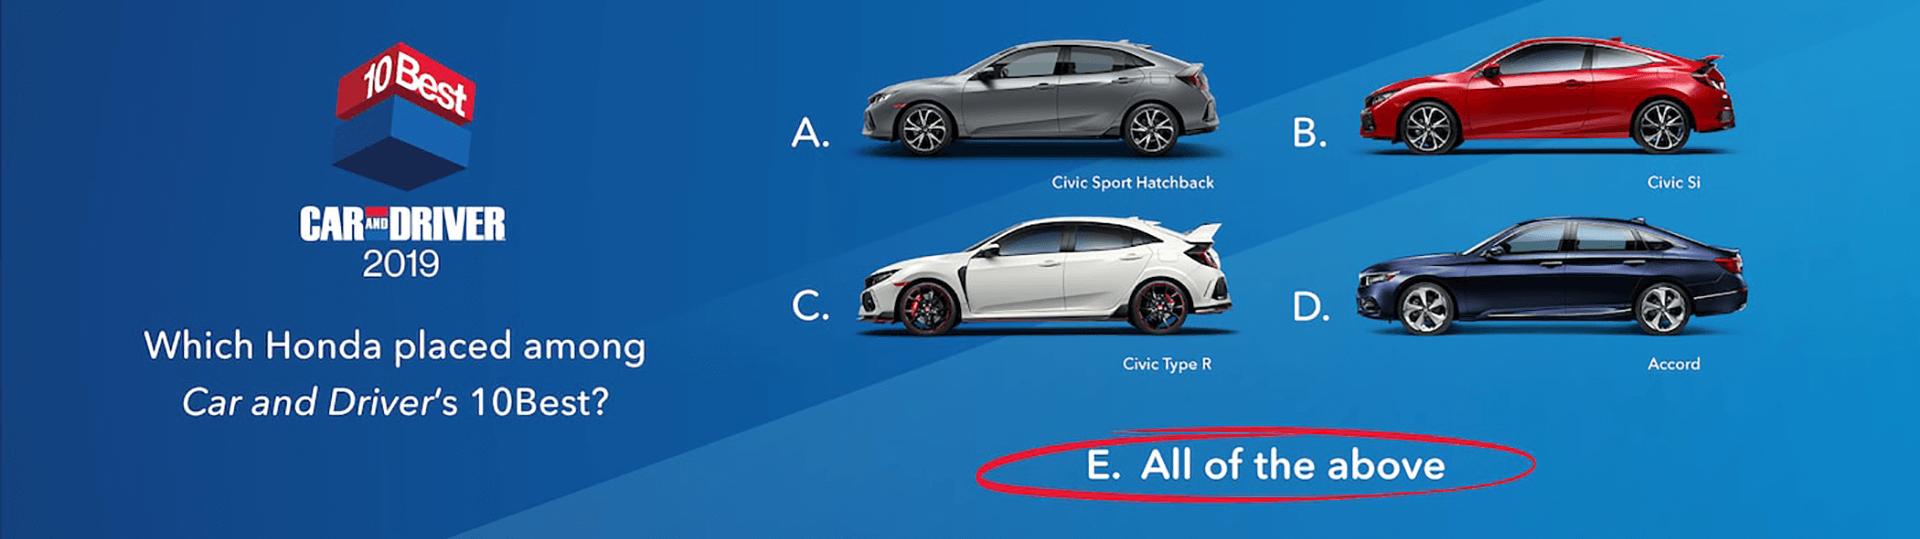 Honda 2019 Car and Driver 10Best Slider